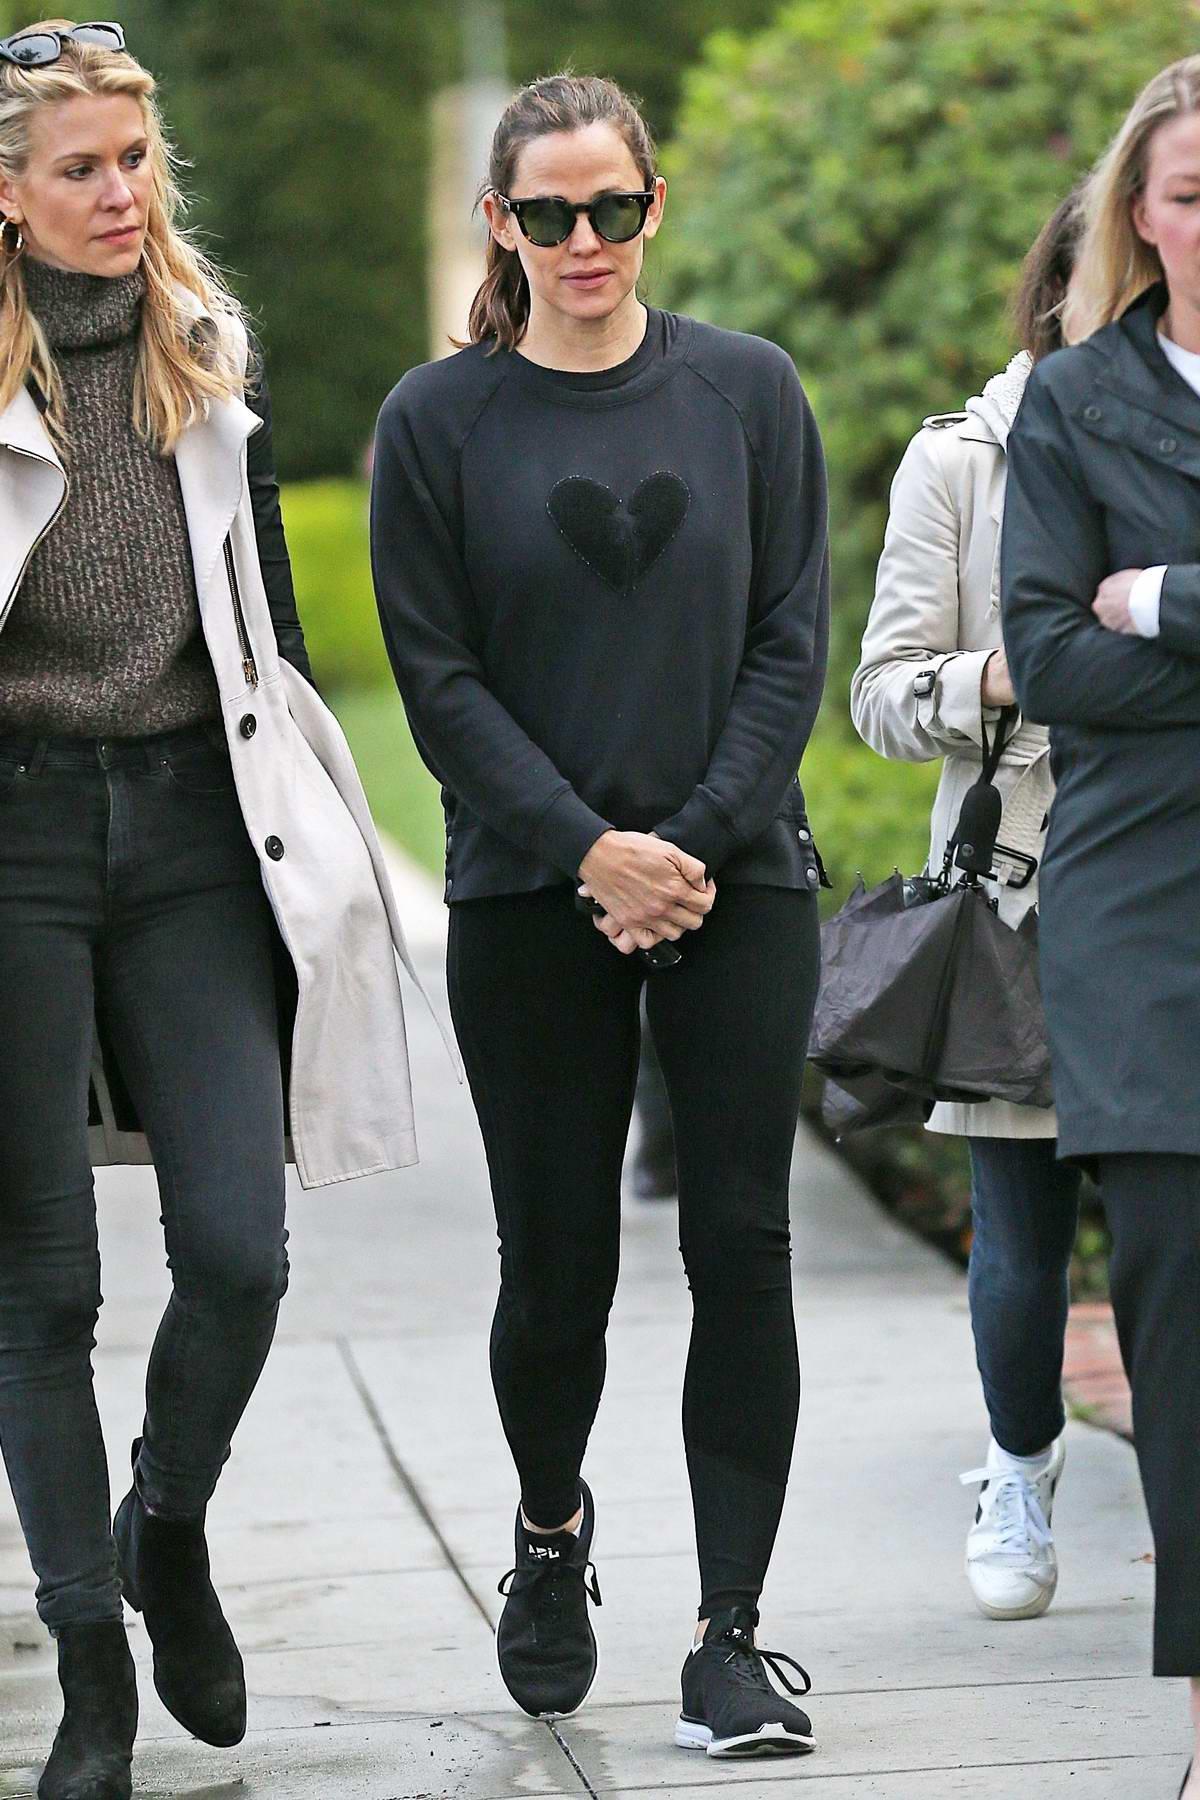 Jennifer Garner wears broken heart jumper and black leggings while out for a walk with her friends in Santa Monica, California